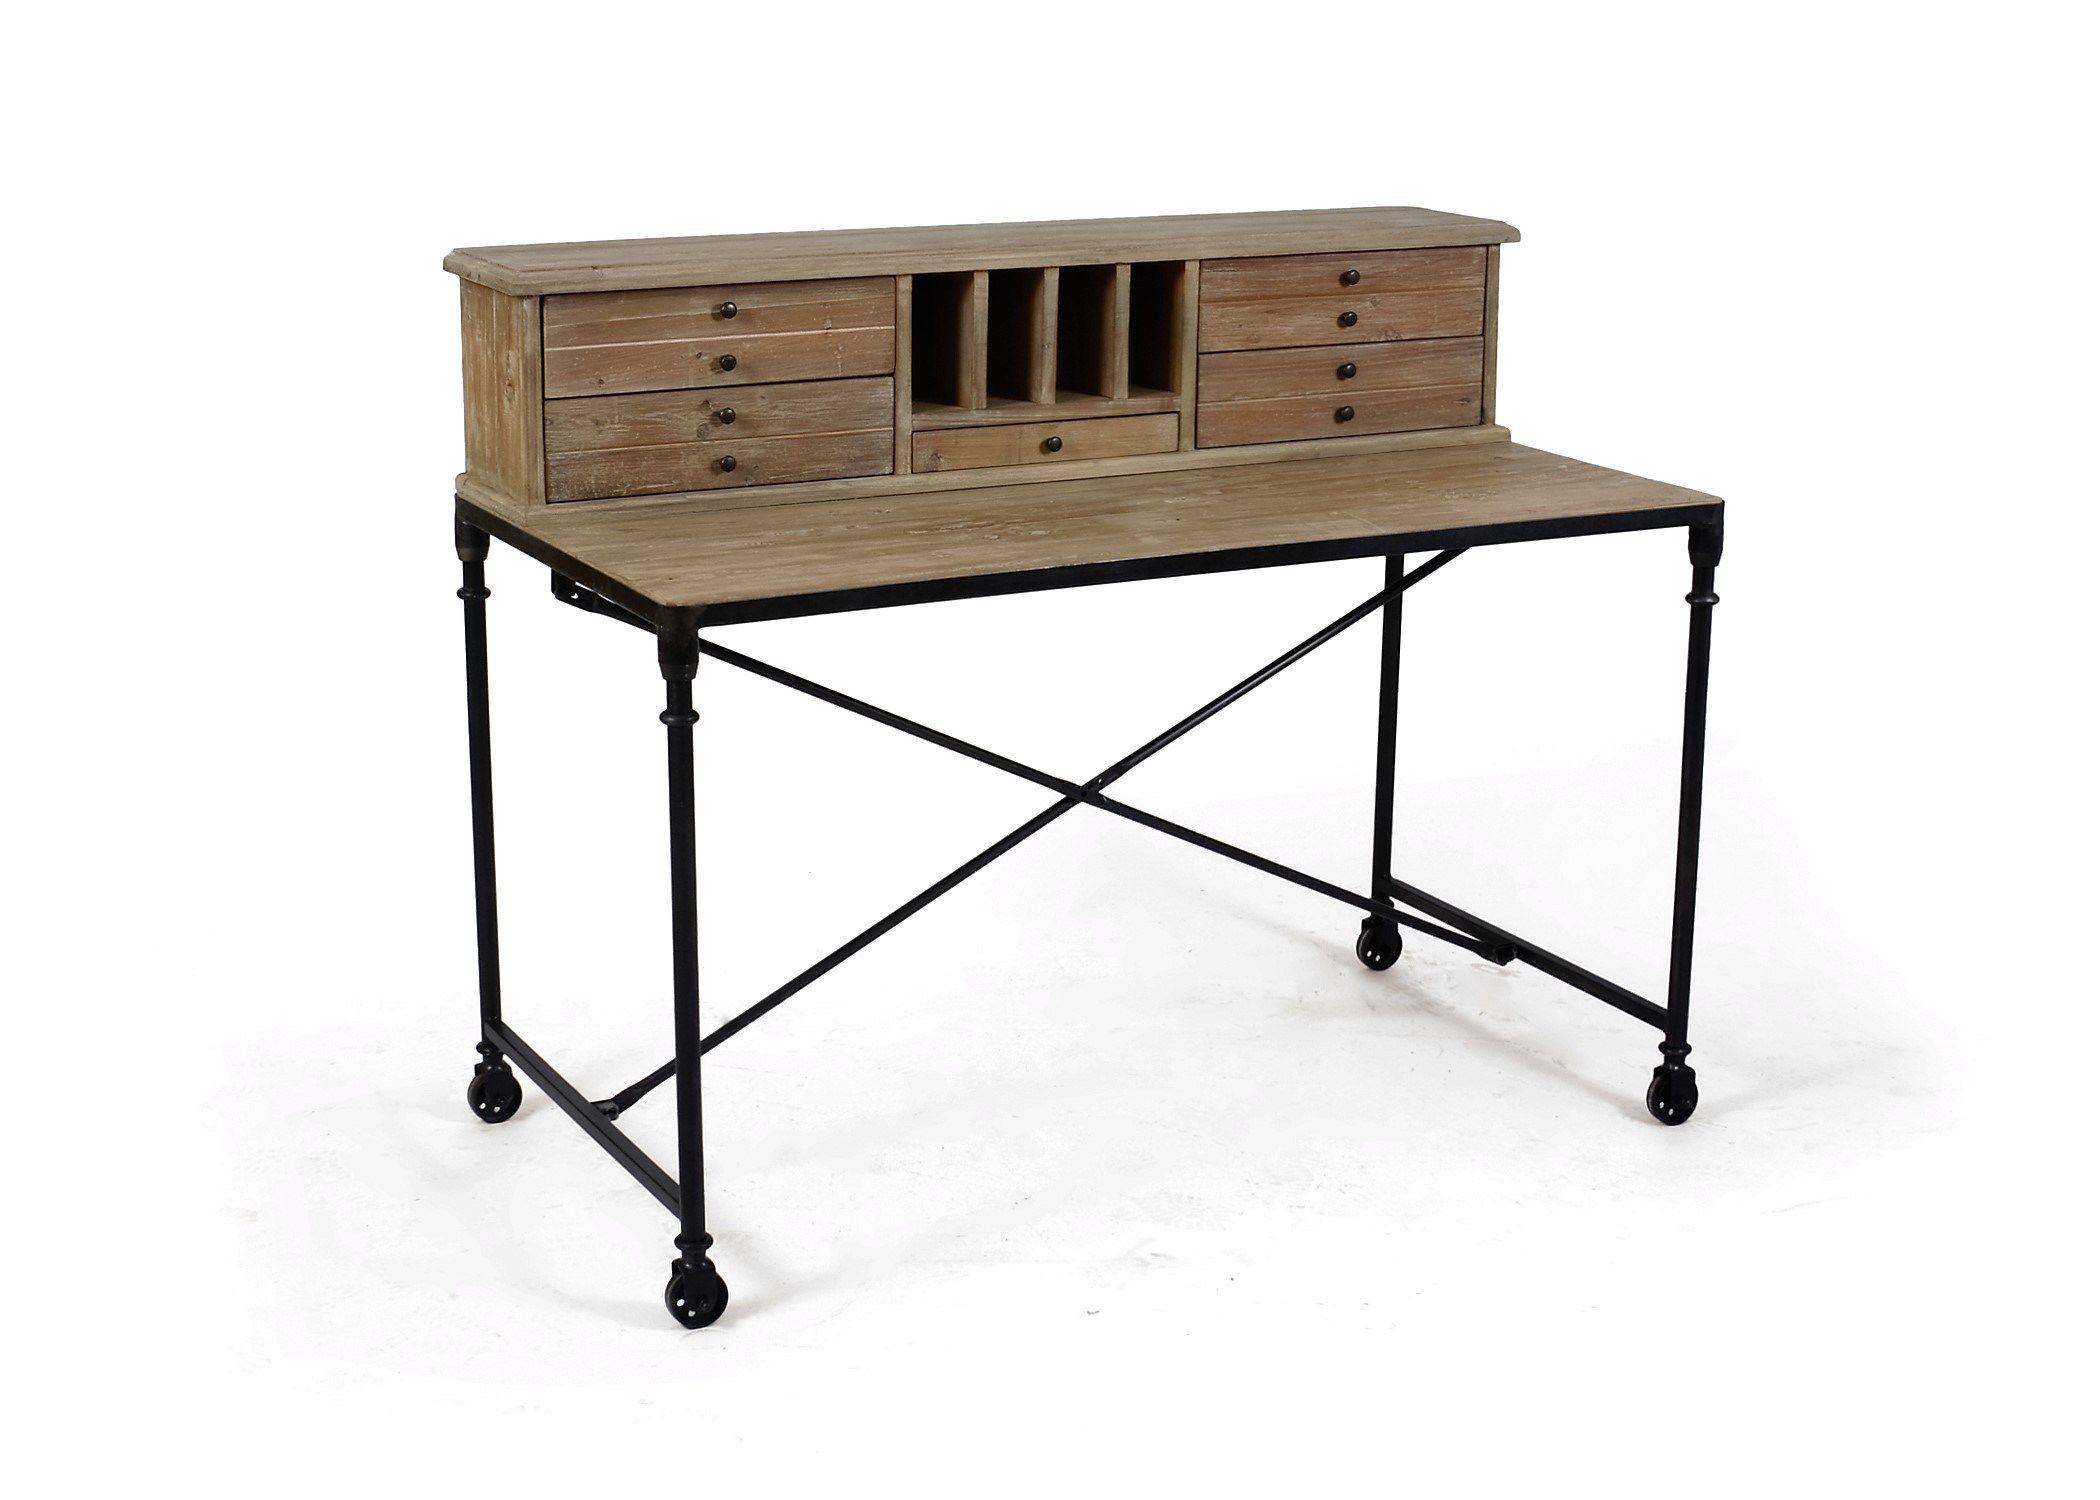 Rustic Office Desk Small Rustic Desk For Home Office Dorm